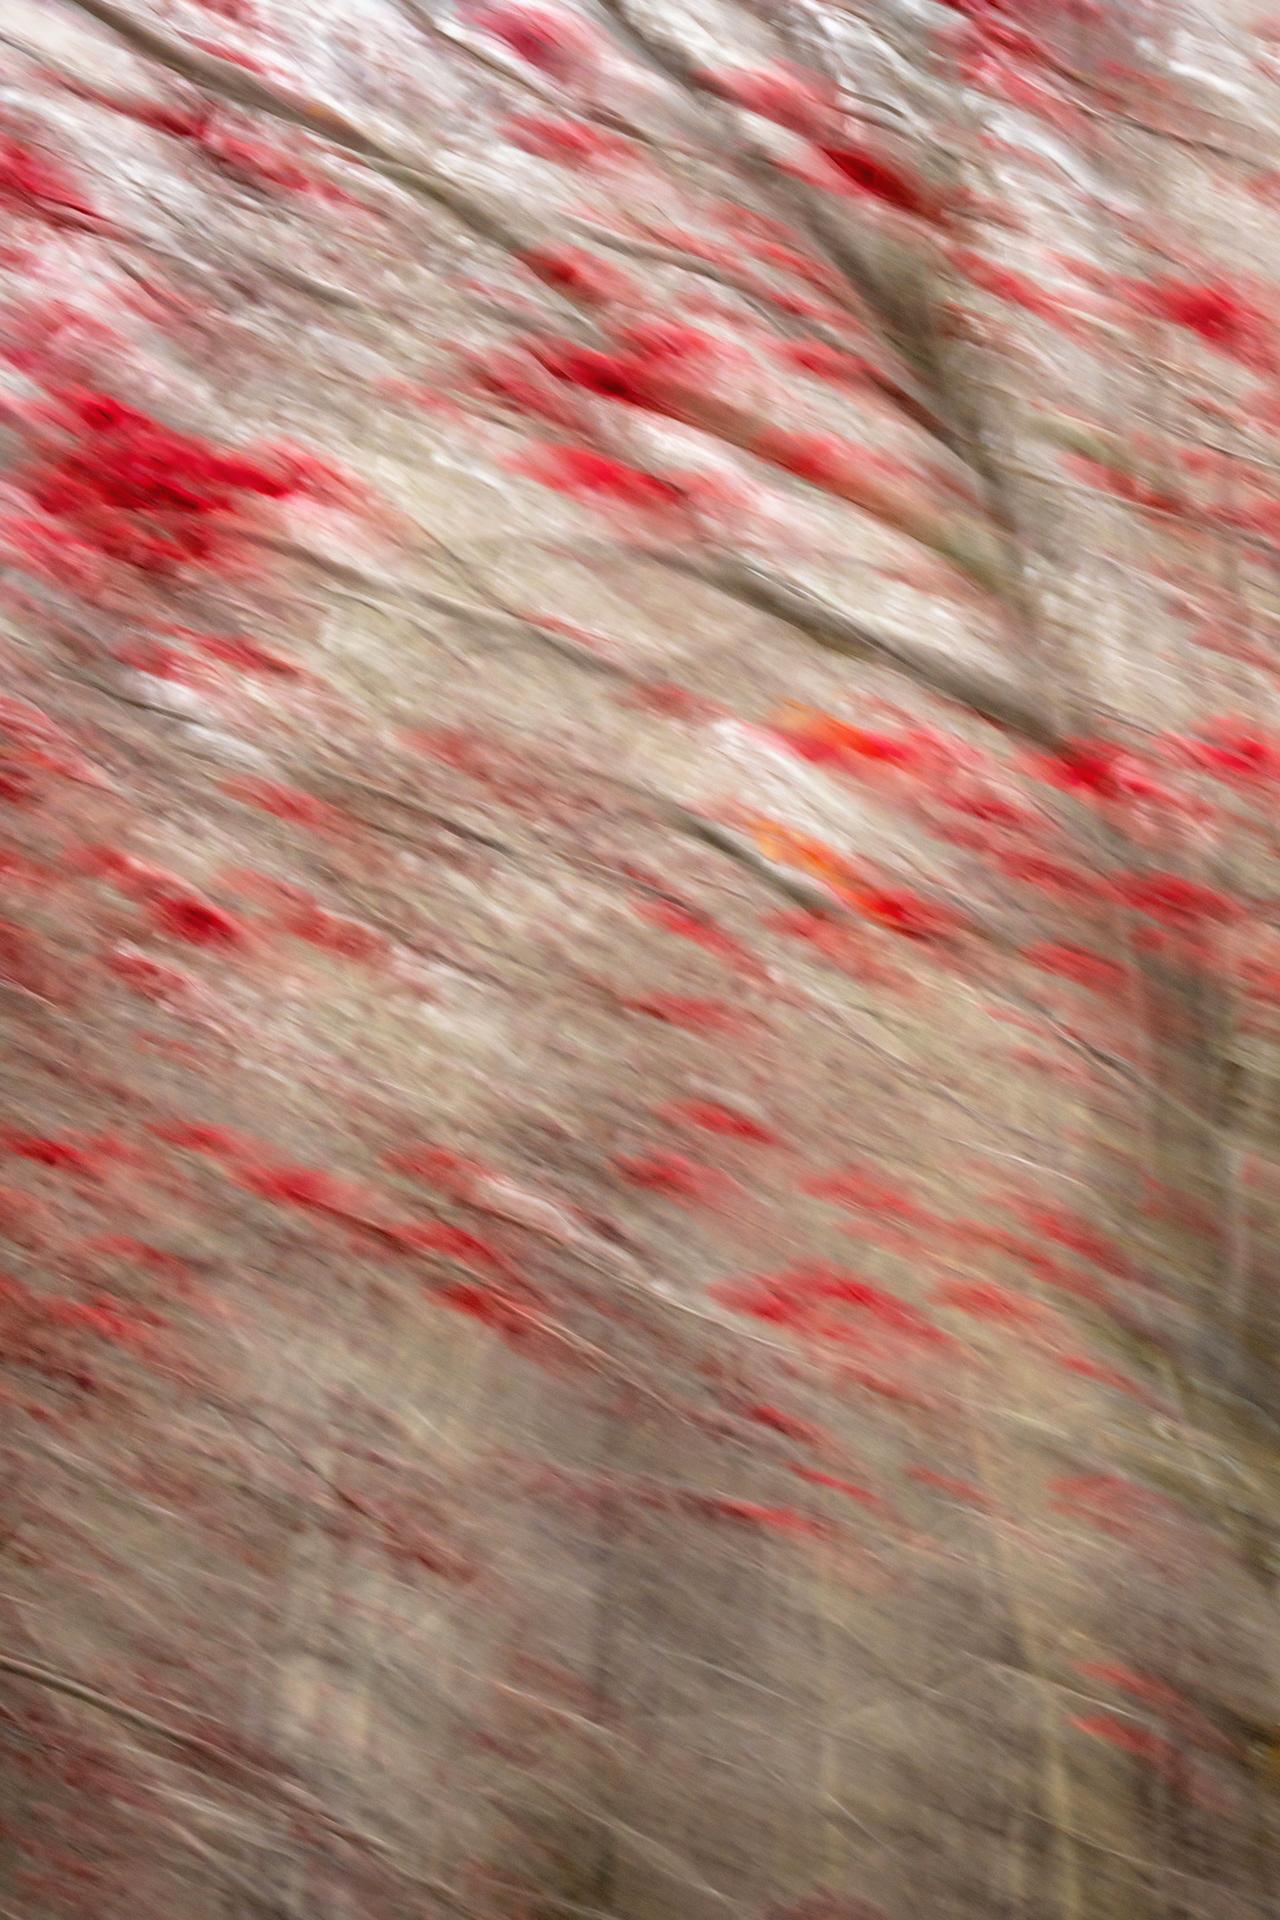 Berry Clusters - Homer, Alaska ©2018 Brian Rivera Uncapher